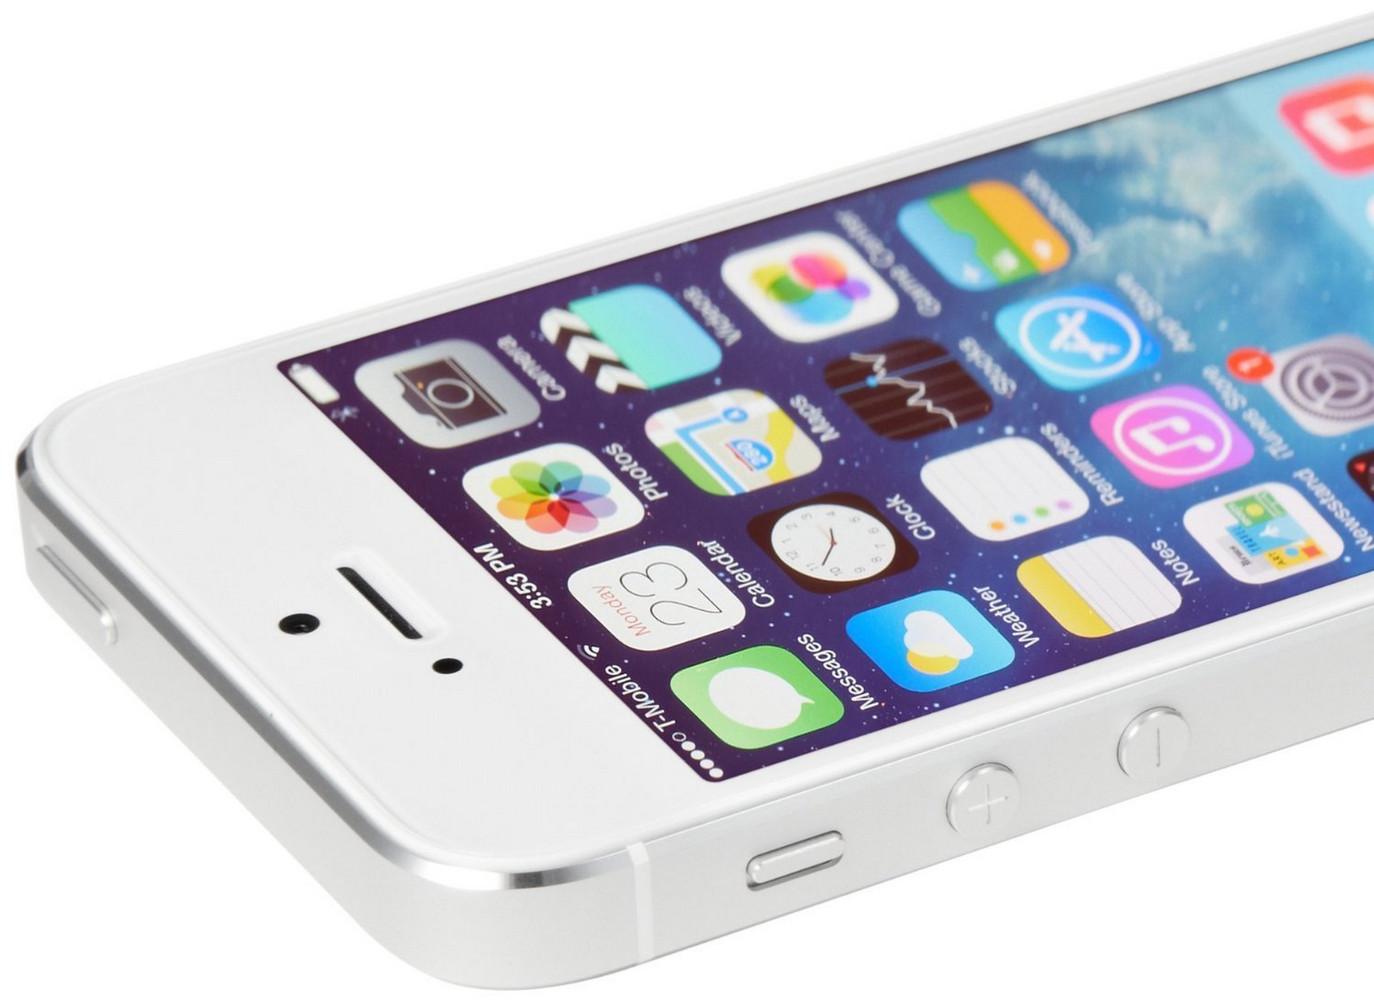 Apple-iPhone-5s-Unlocked-GSM-Unlocked-AT-amp-T-Verizon-T-Mobile-A1533 thumbnail 19